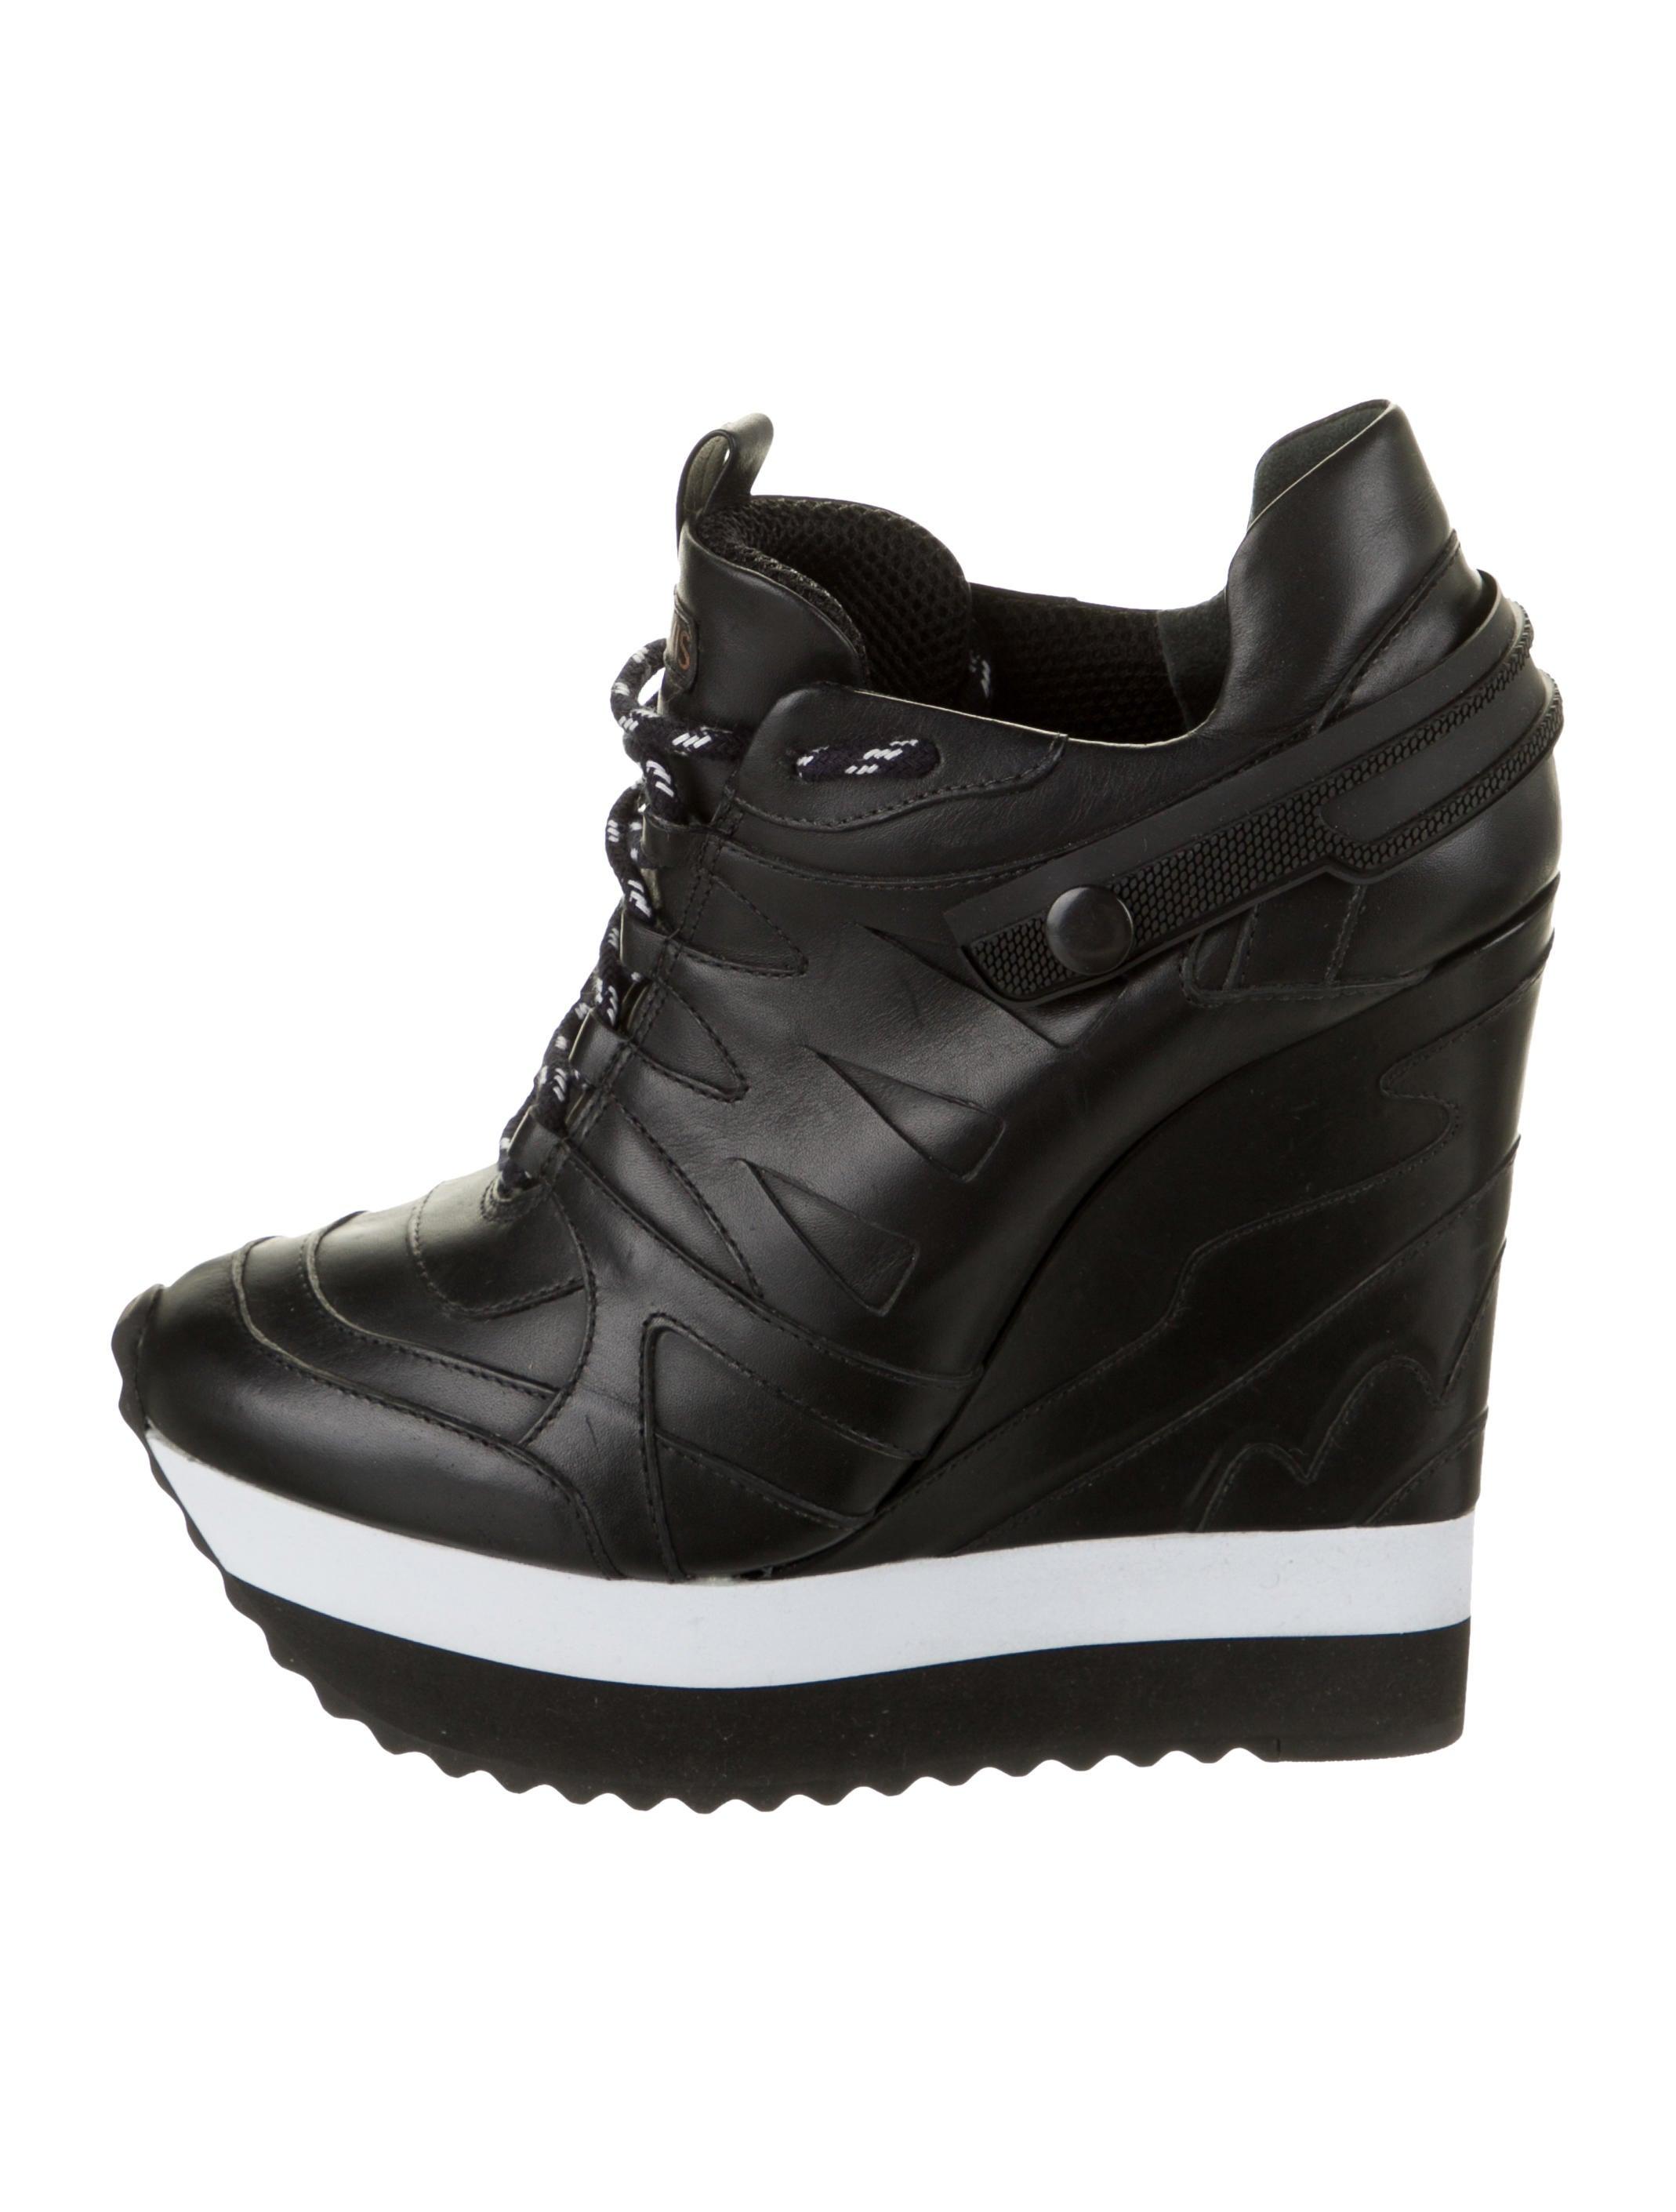 Ruthie Davis 2019 Jamie Sneaker - Shoes